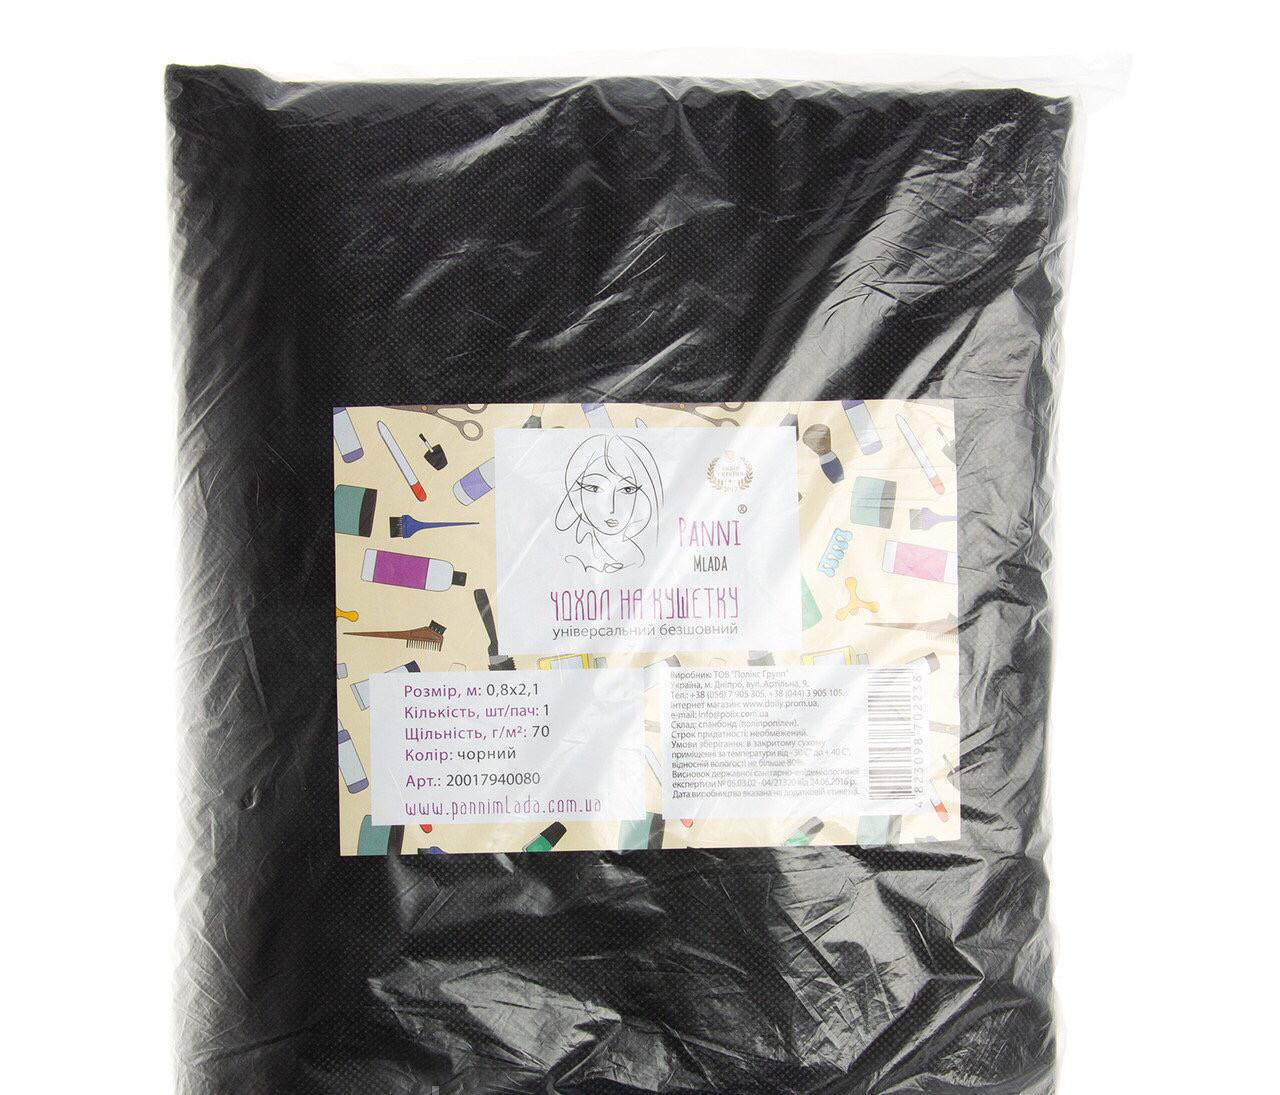 Чехол на кушетку на резинке из спанбонда 0,8*2,1 м, чёрный